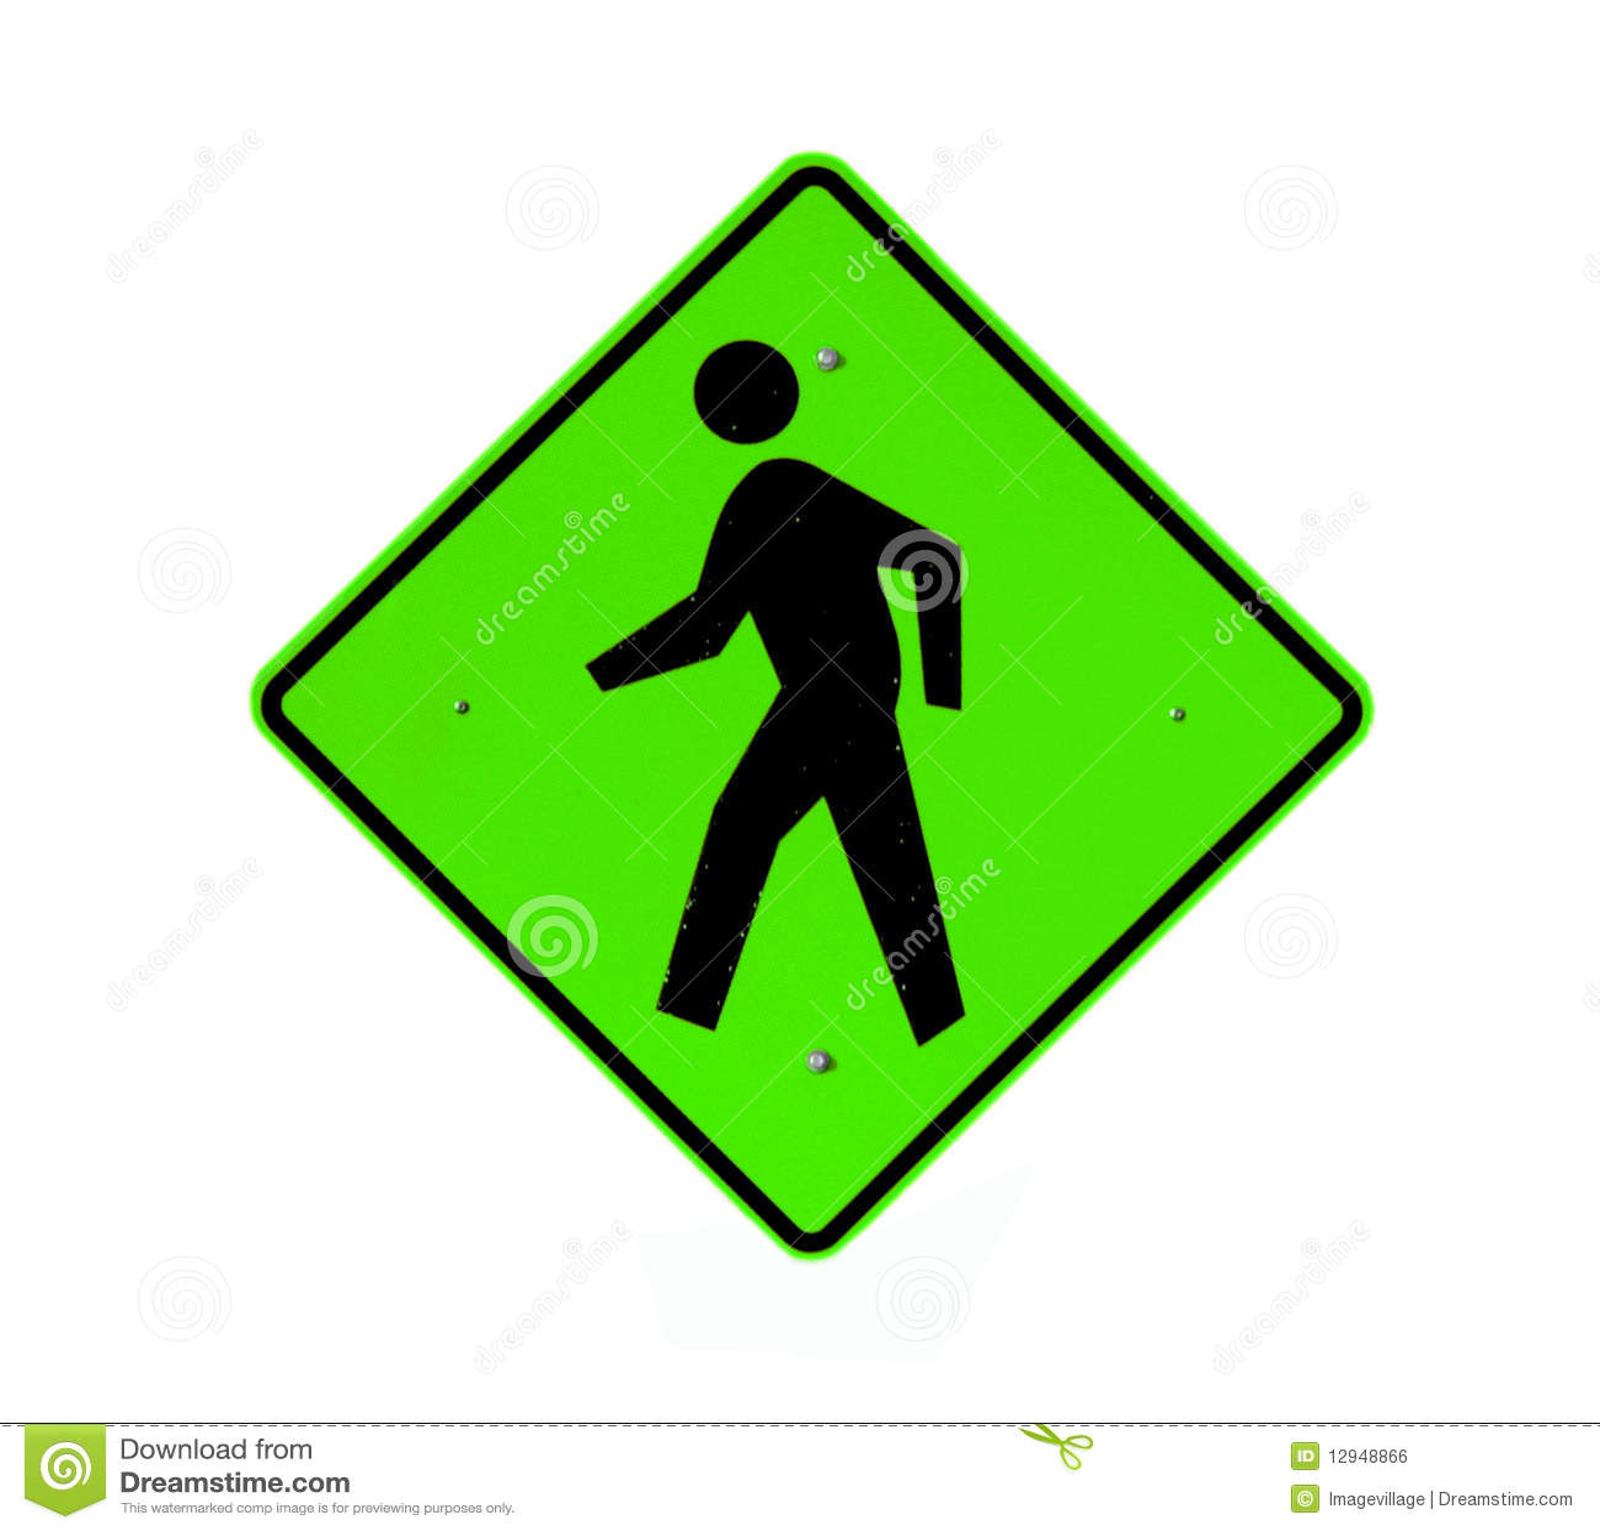 Walking Path Sign Royalty Free Stock Image